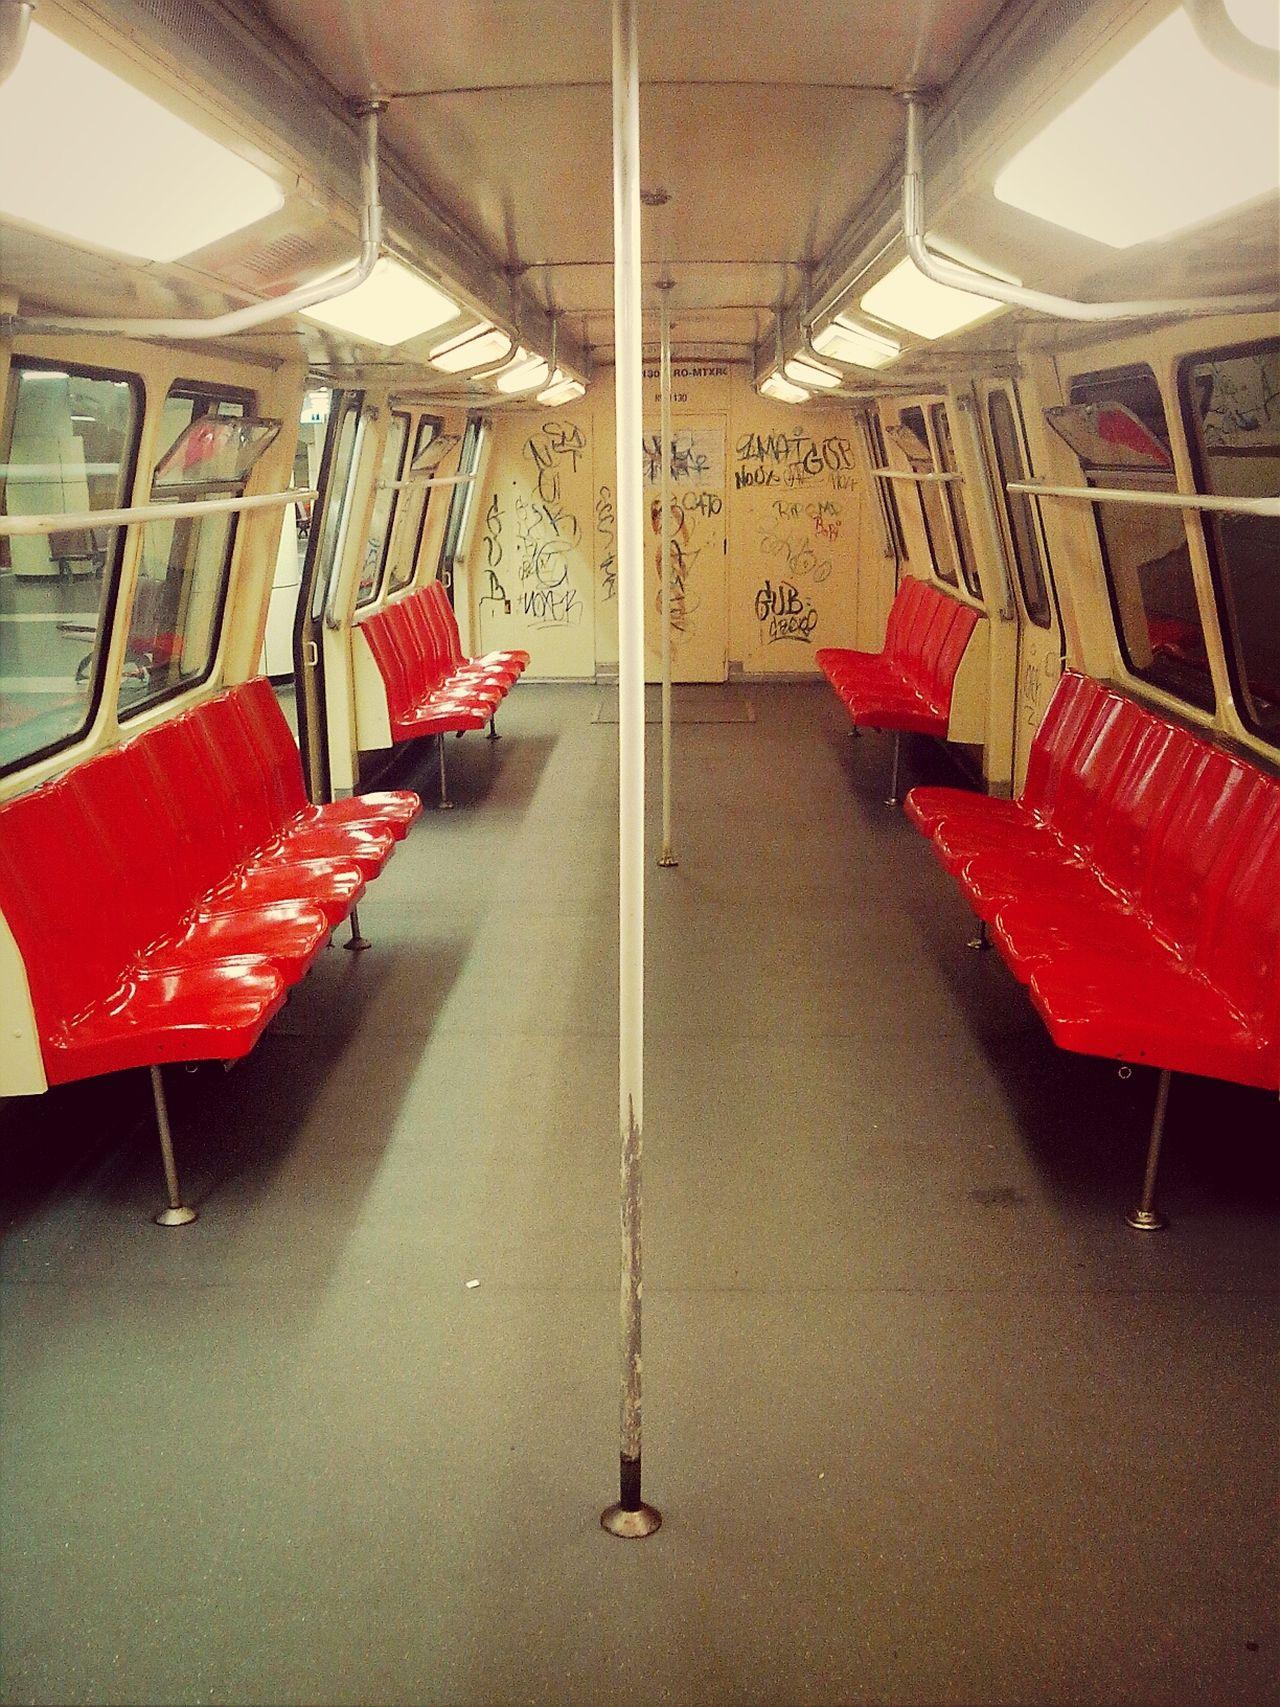 Metrou vintage... EyeEm Best Shots The Explorer - 2014 EyeEm Awards Subway City Life